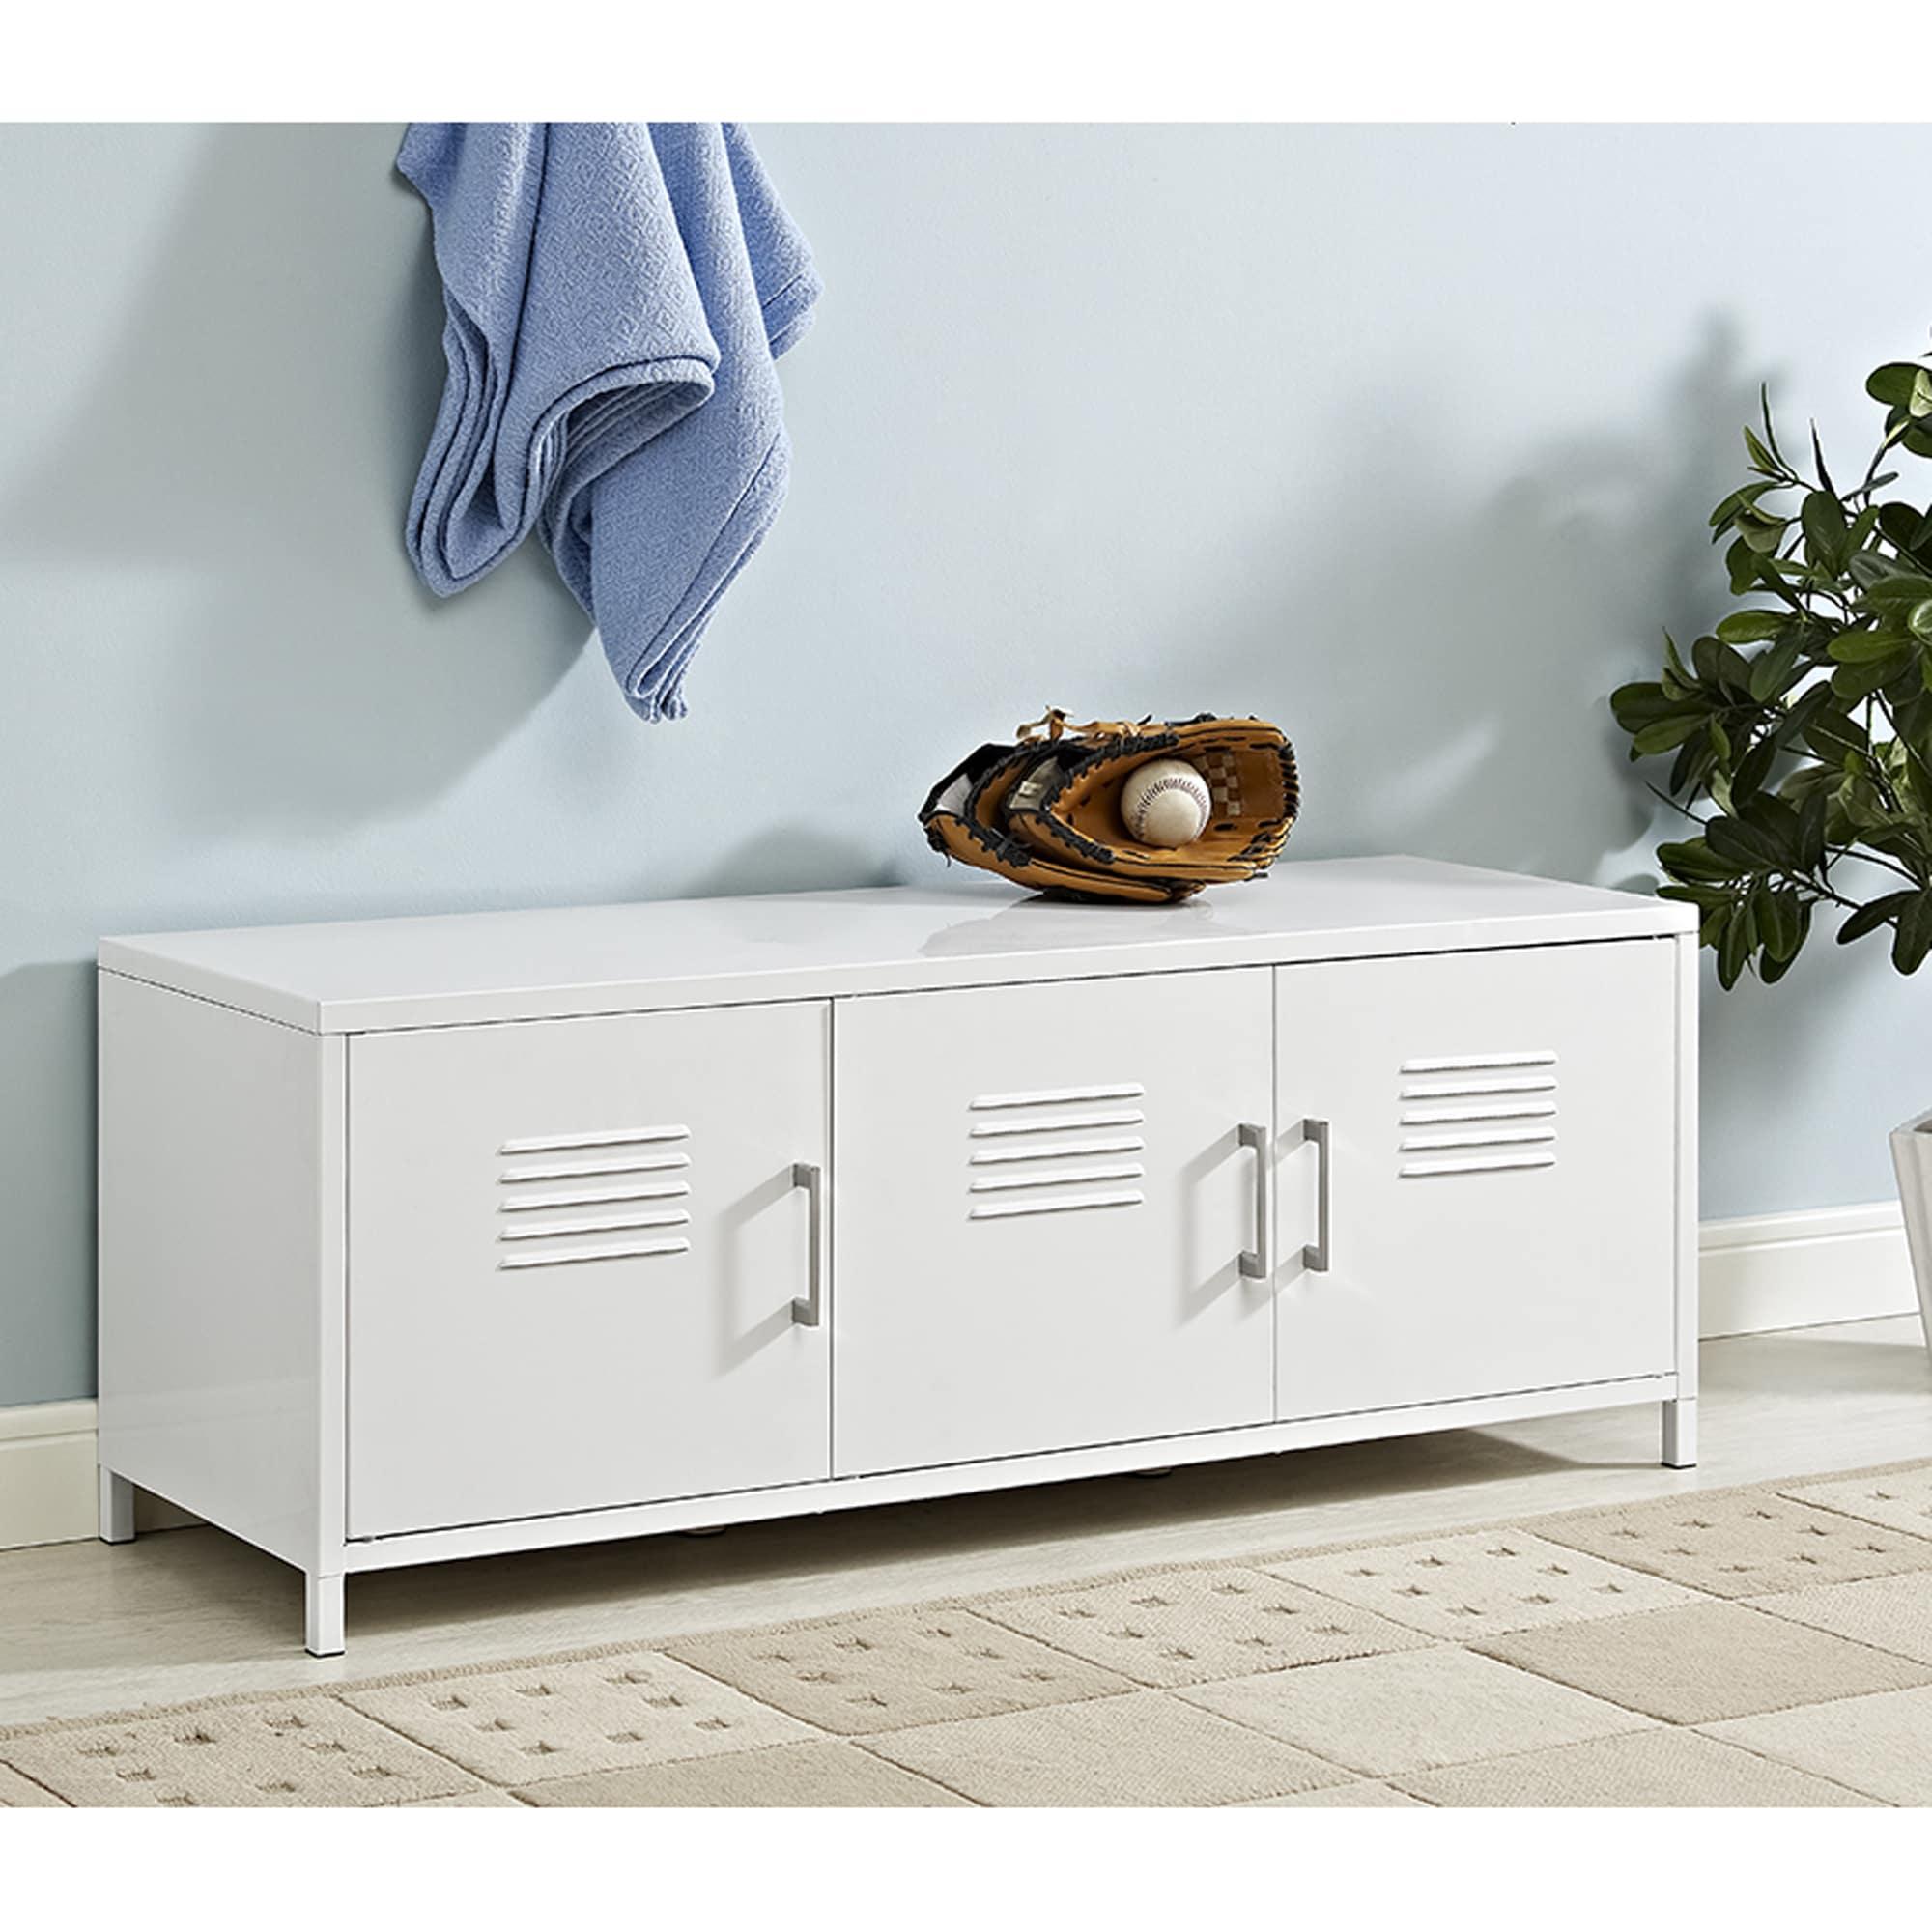 "48"" Metal Locker Style Storage Bench - White"